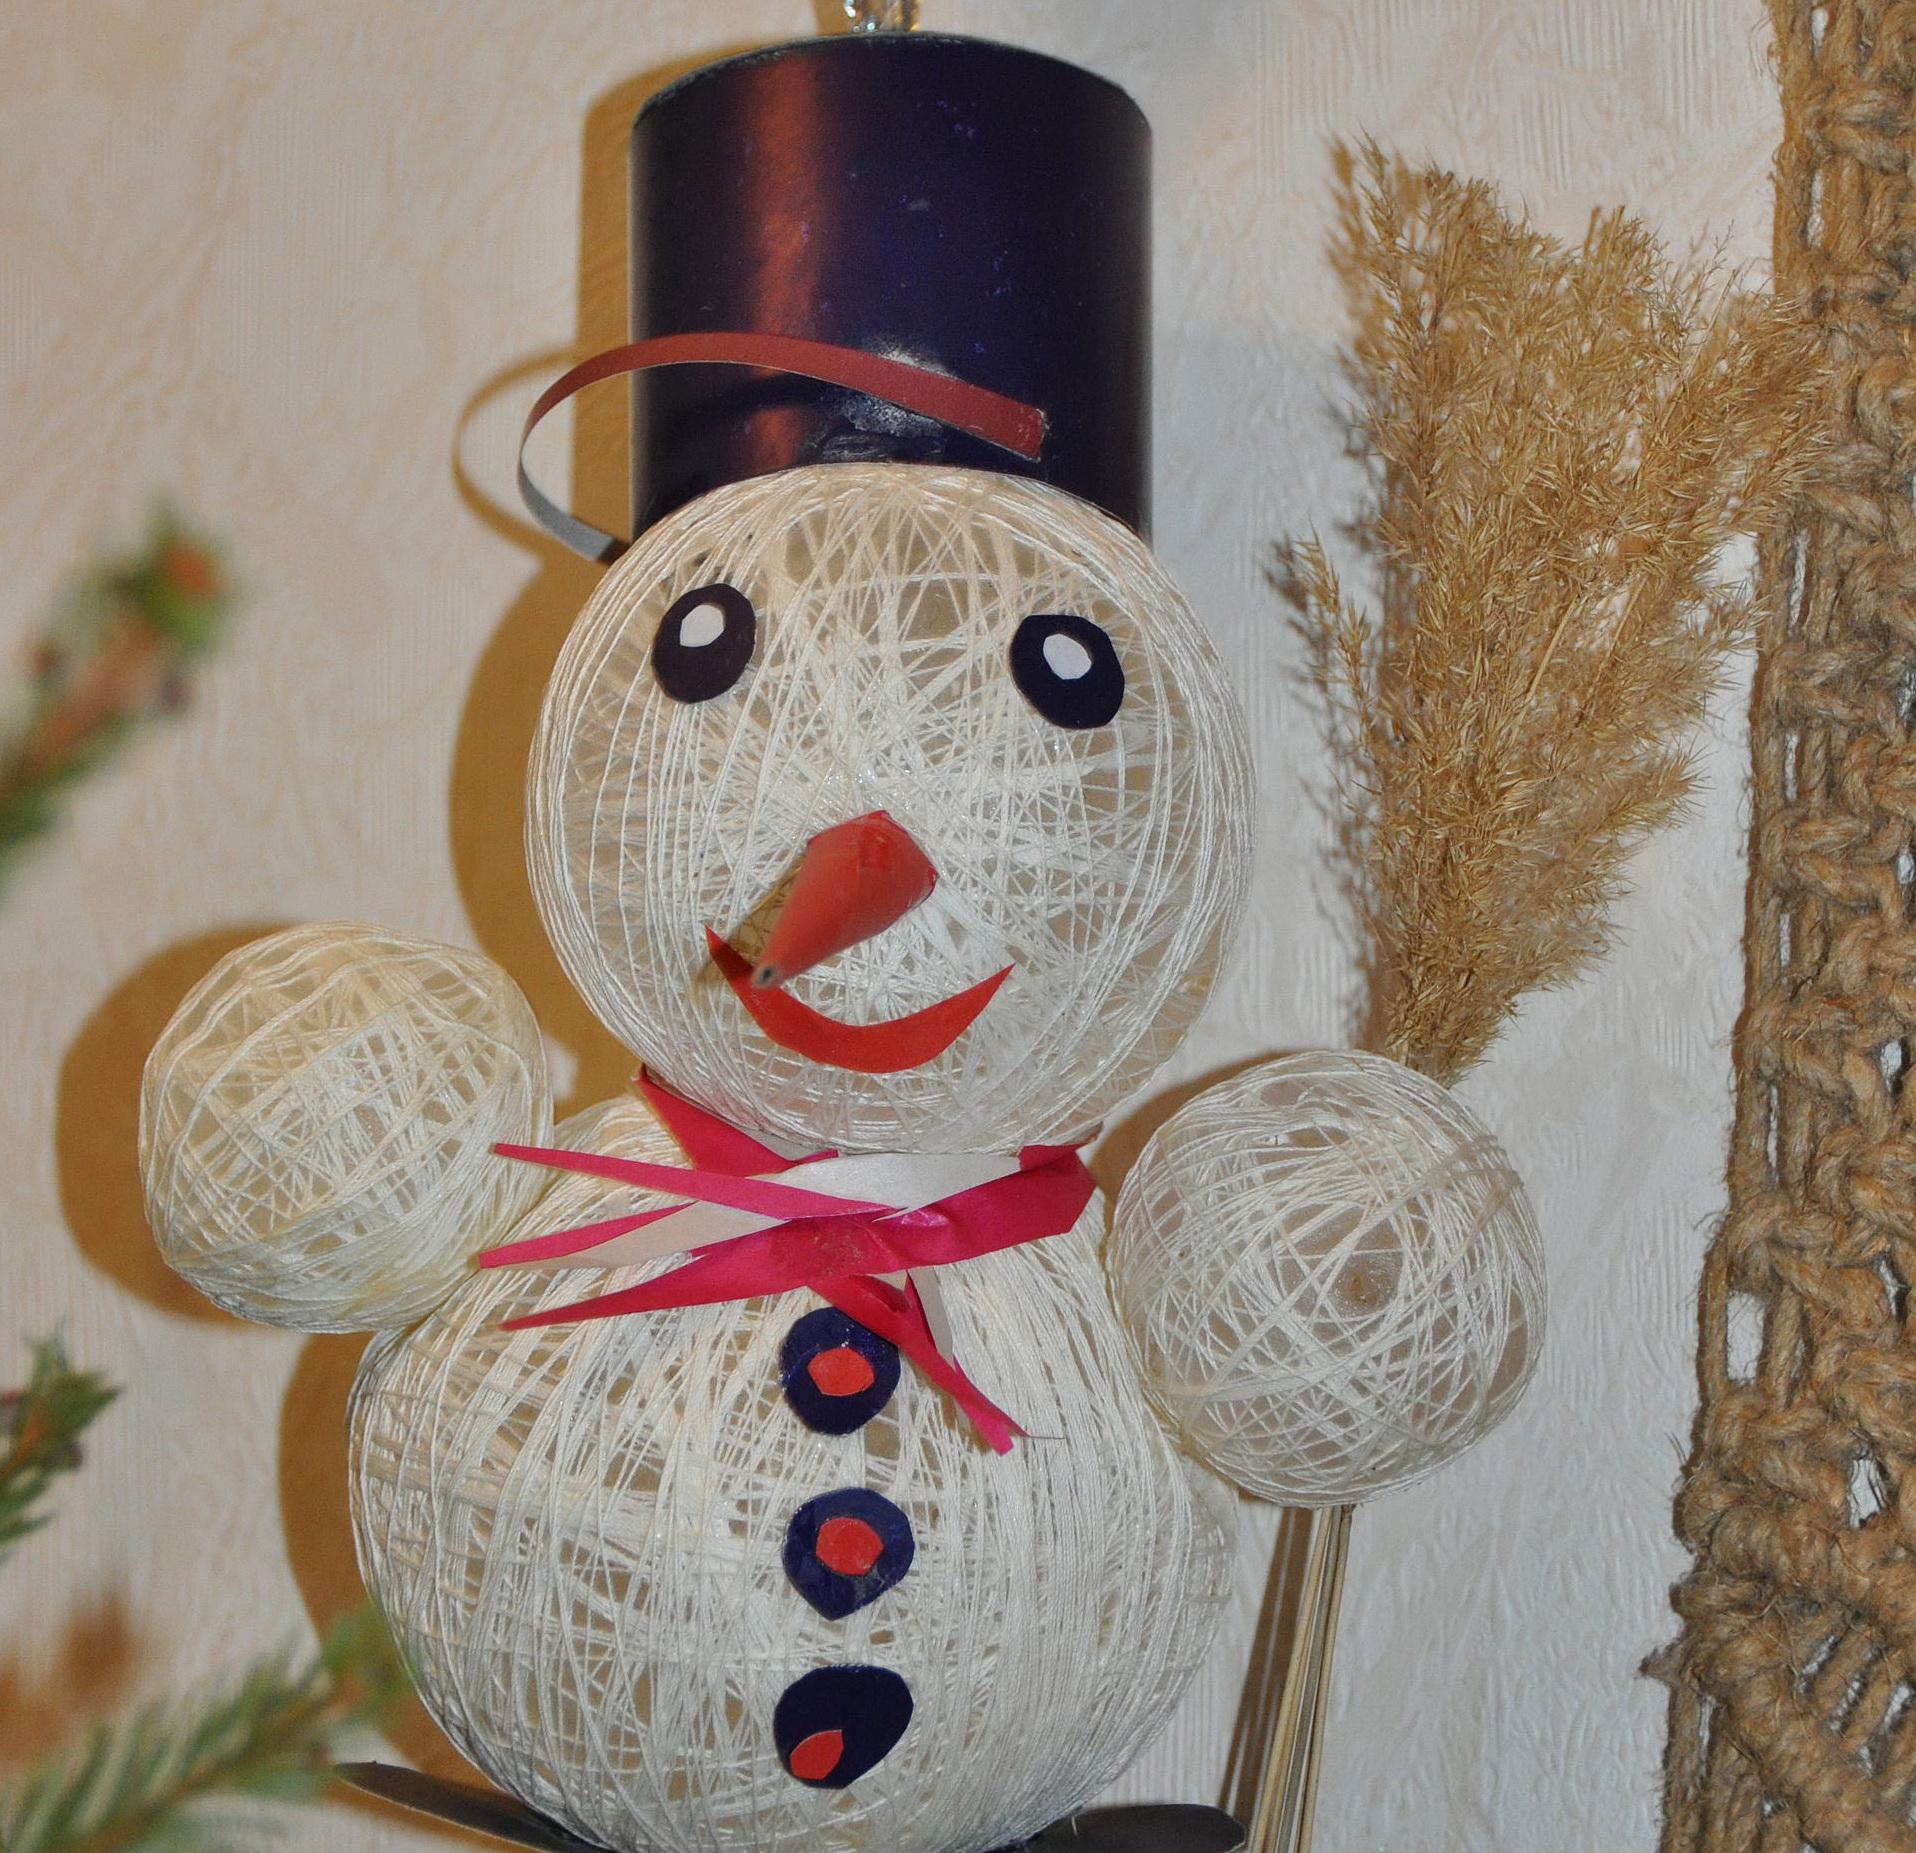 ᐉ снеговик из ниток своими руками пошаговое фото. поделка снеговик из ниток и шаров своими руками ➡ klass511.ru